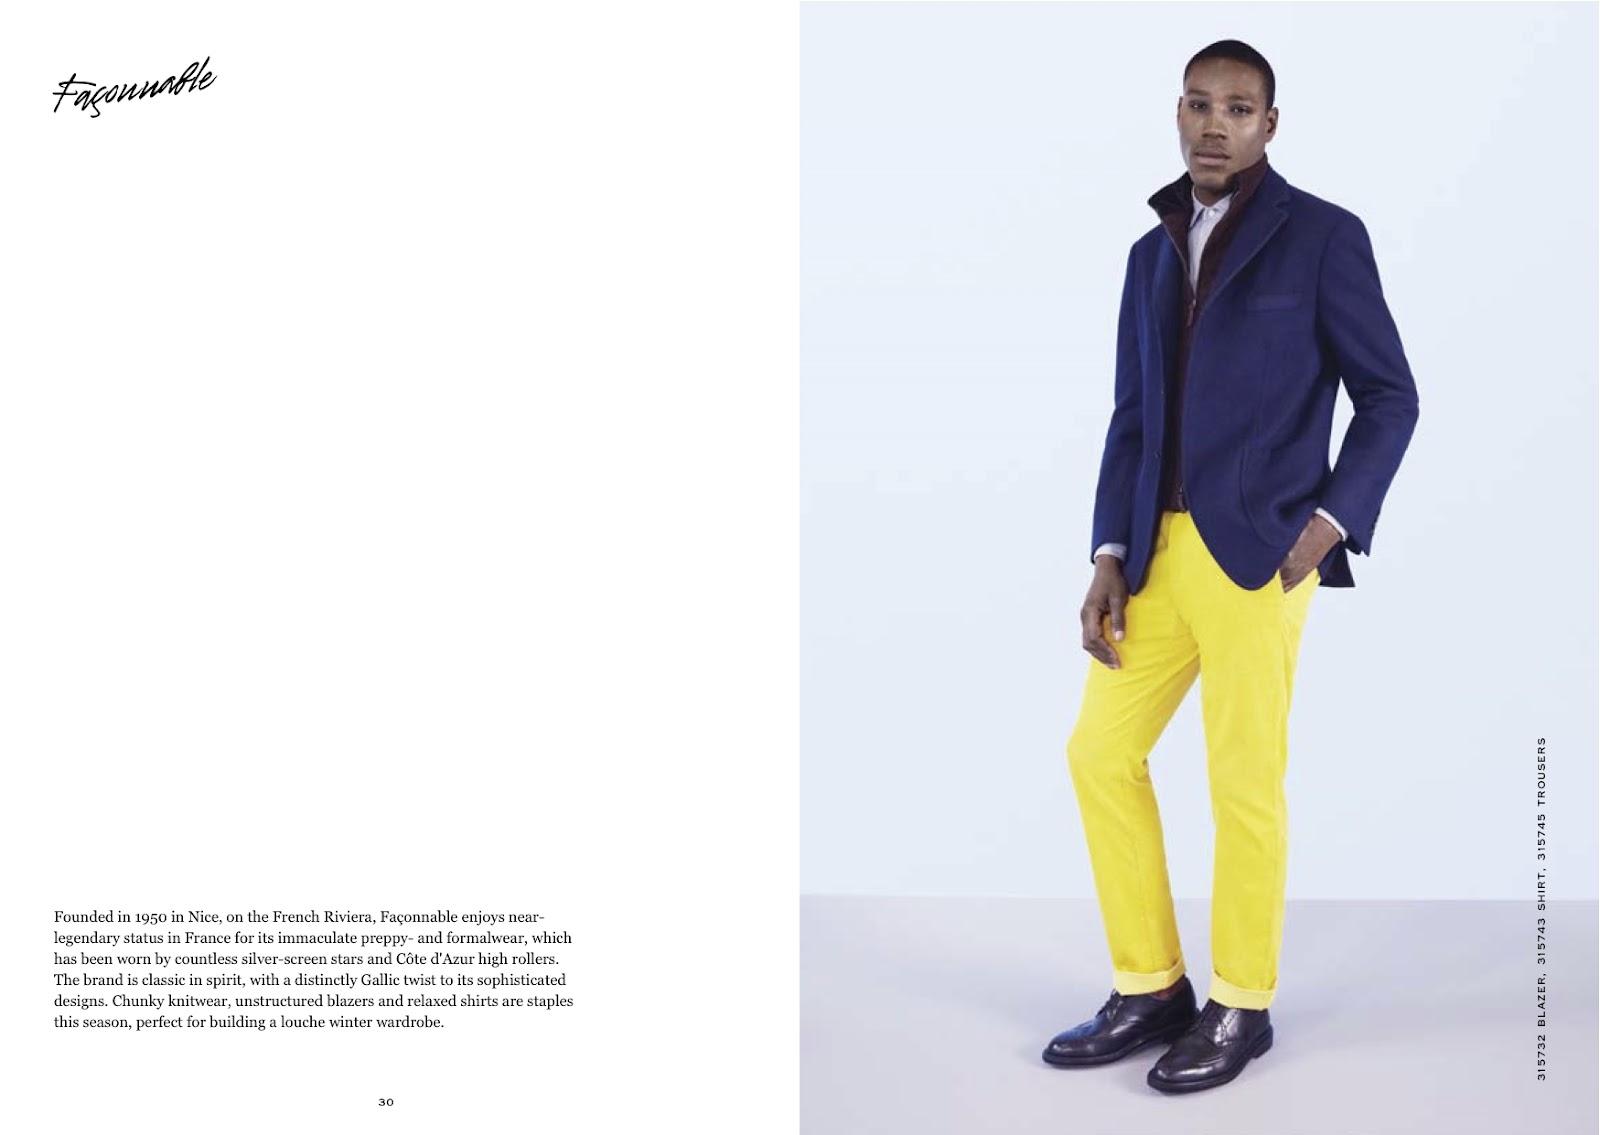 Faconnable+FW12+Mr+Porter+00o00+London+Menswear+Blog